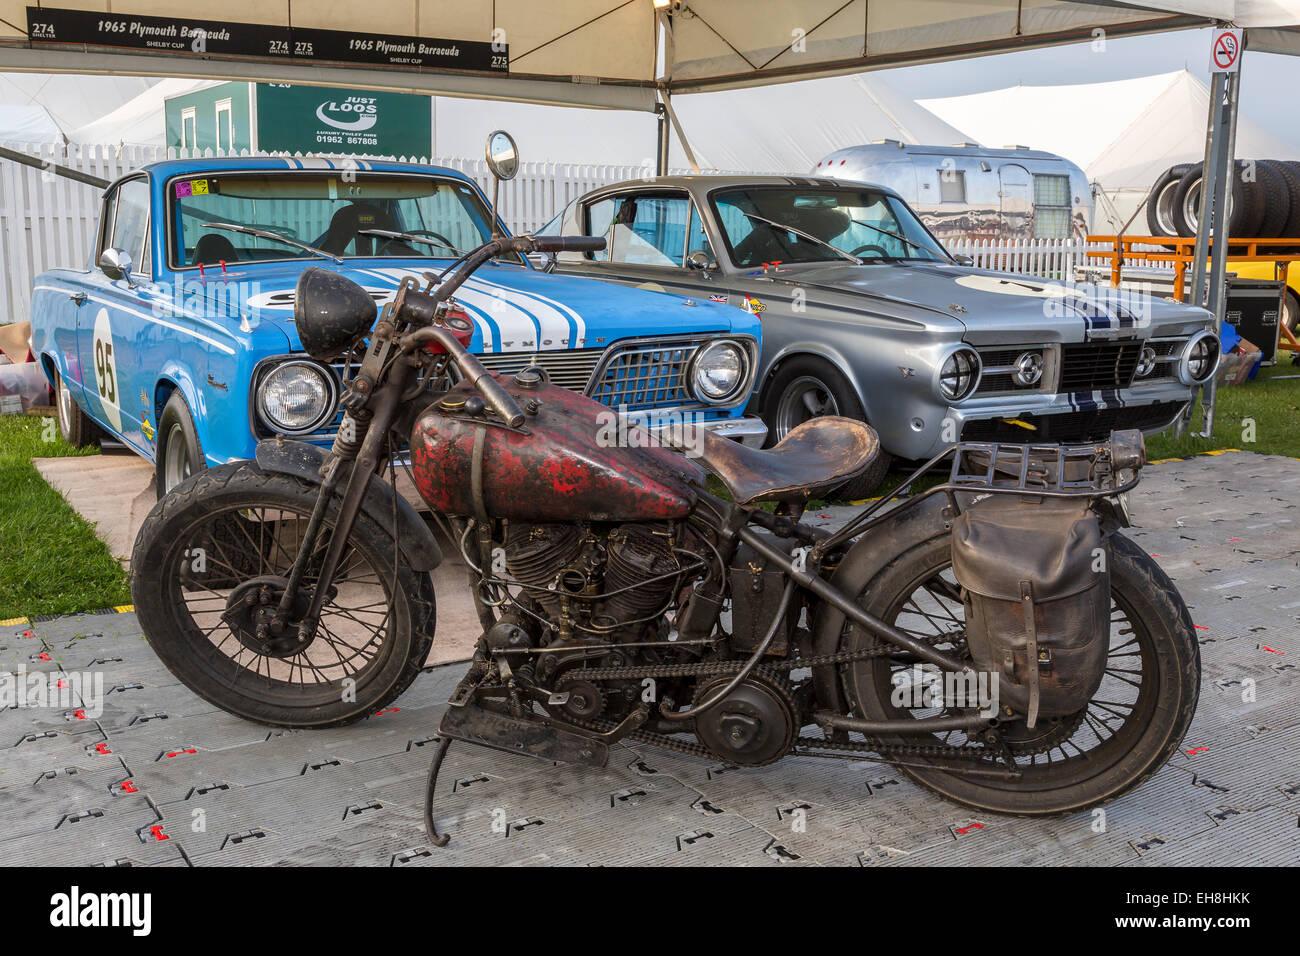 Vintage Harley Davidson Parkte Vor 2 1965 Plymouth Barracuda Shelby